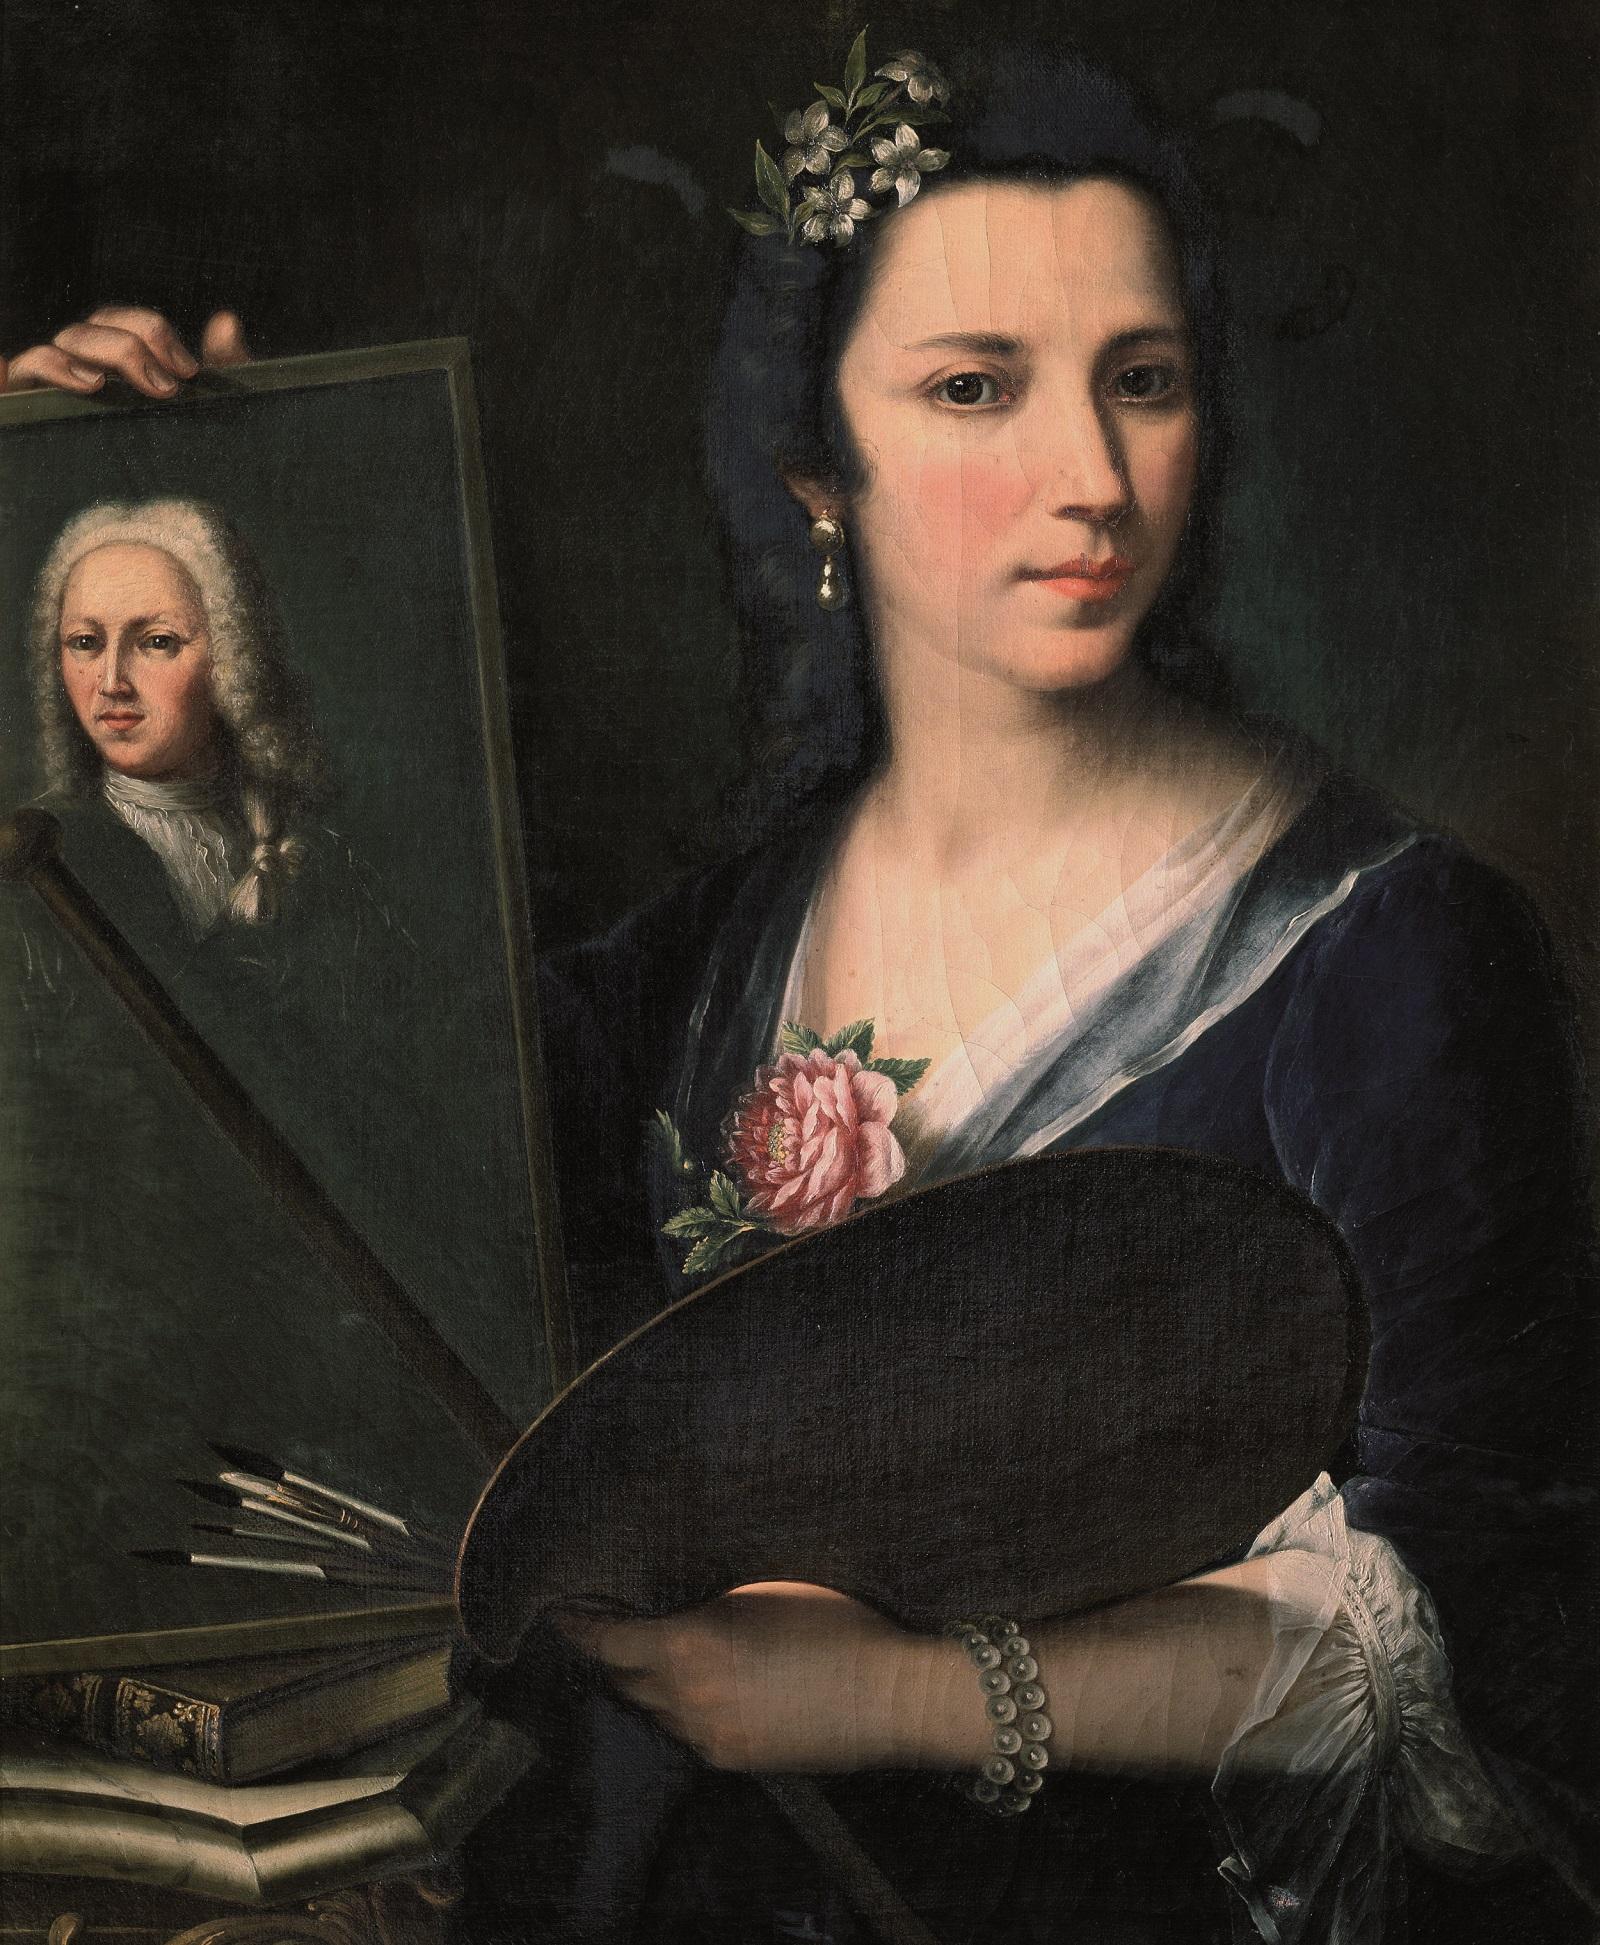 "Violante Siries Cerroti's Self Portrait, Uffizi Gallery Collection     Normal   0       14       false   false   false     IT   X-NONE   X-NONE                                                                                                                                                                                                                                                                                                                                                                          /* Style Definitions */  table.MsoNormalTable {mso-style-name:""Tabella normale""; mso-tstyle-rowband-size:0; mso-tstyle-colband-size:0; mso-style-noshow:yes; mso-style-priority:99; mso-style-qformat:yes; mso-style-parent:""""; mso-padding-alt:0cm 5.4pt 0cm 5.4pt; mso-para-margin:0cm; mso-para-margin-bottom:.0001pt; mso-pagination:widow-orphan; font-size:11.0pt; font-family:""Calibri"",""sans-serif""; mso-ascii-font-family:Calibri; mso-ascii-theme-font:minor-latin; mso-fareast-font-family:""Times New Roman""; mso-fareast-theme-font:minor-fareast; mso-hansi-font-family:Calibri; mso-hansi-theme-font:minor-latin;}"